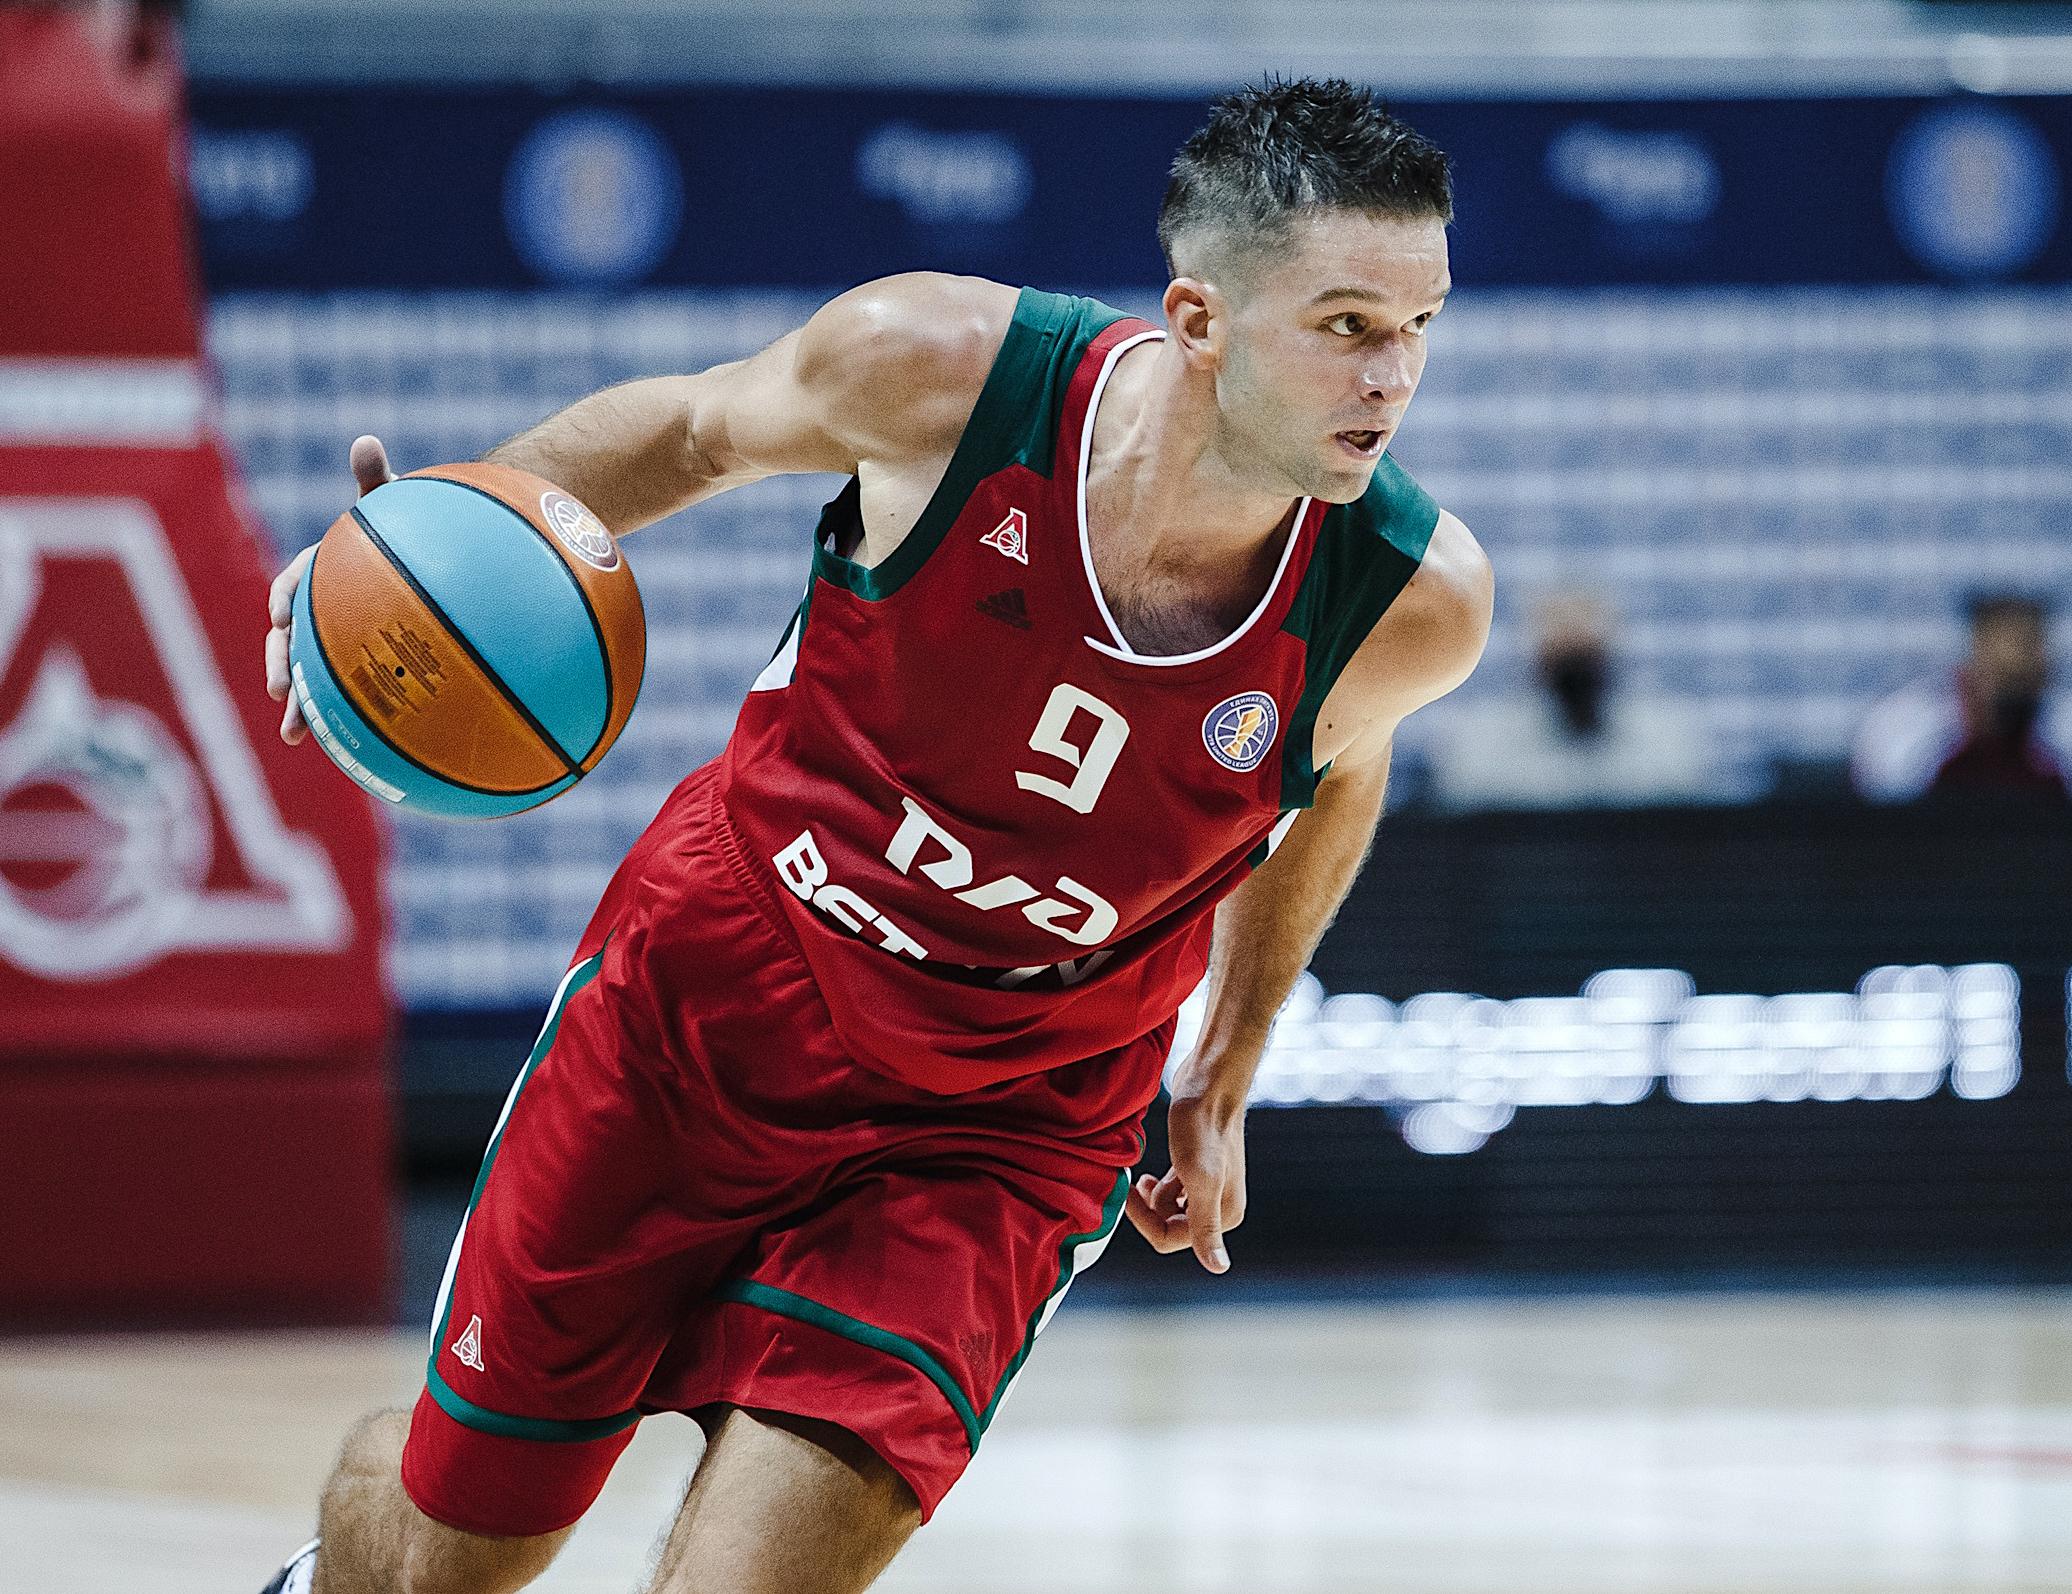 Mantas Kalnietis named regular season MVP